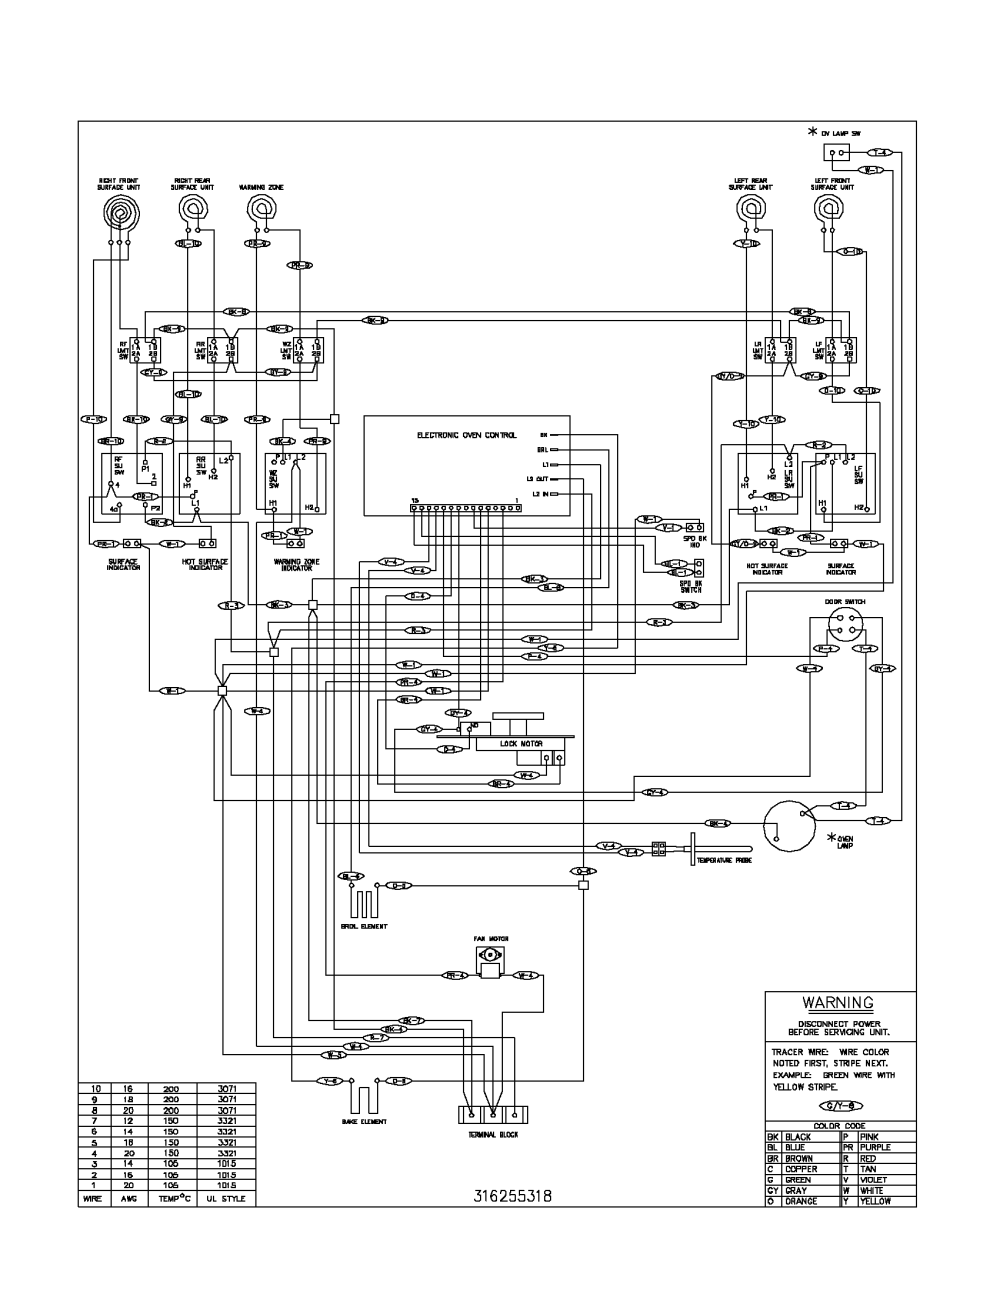 medium resolution of kelvinator wall oven wiring diagram wiring libraryfrigidaire glef378cqb electric range timer stove clocks frigidaire wall oven